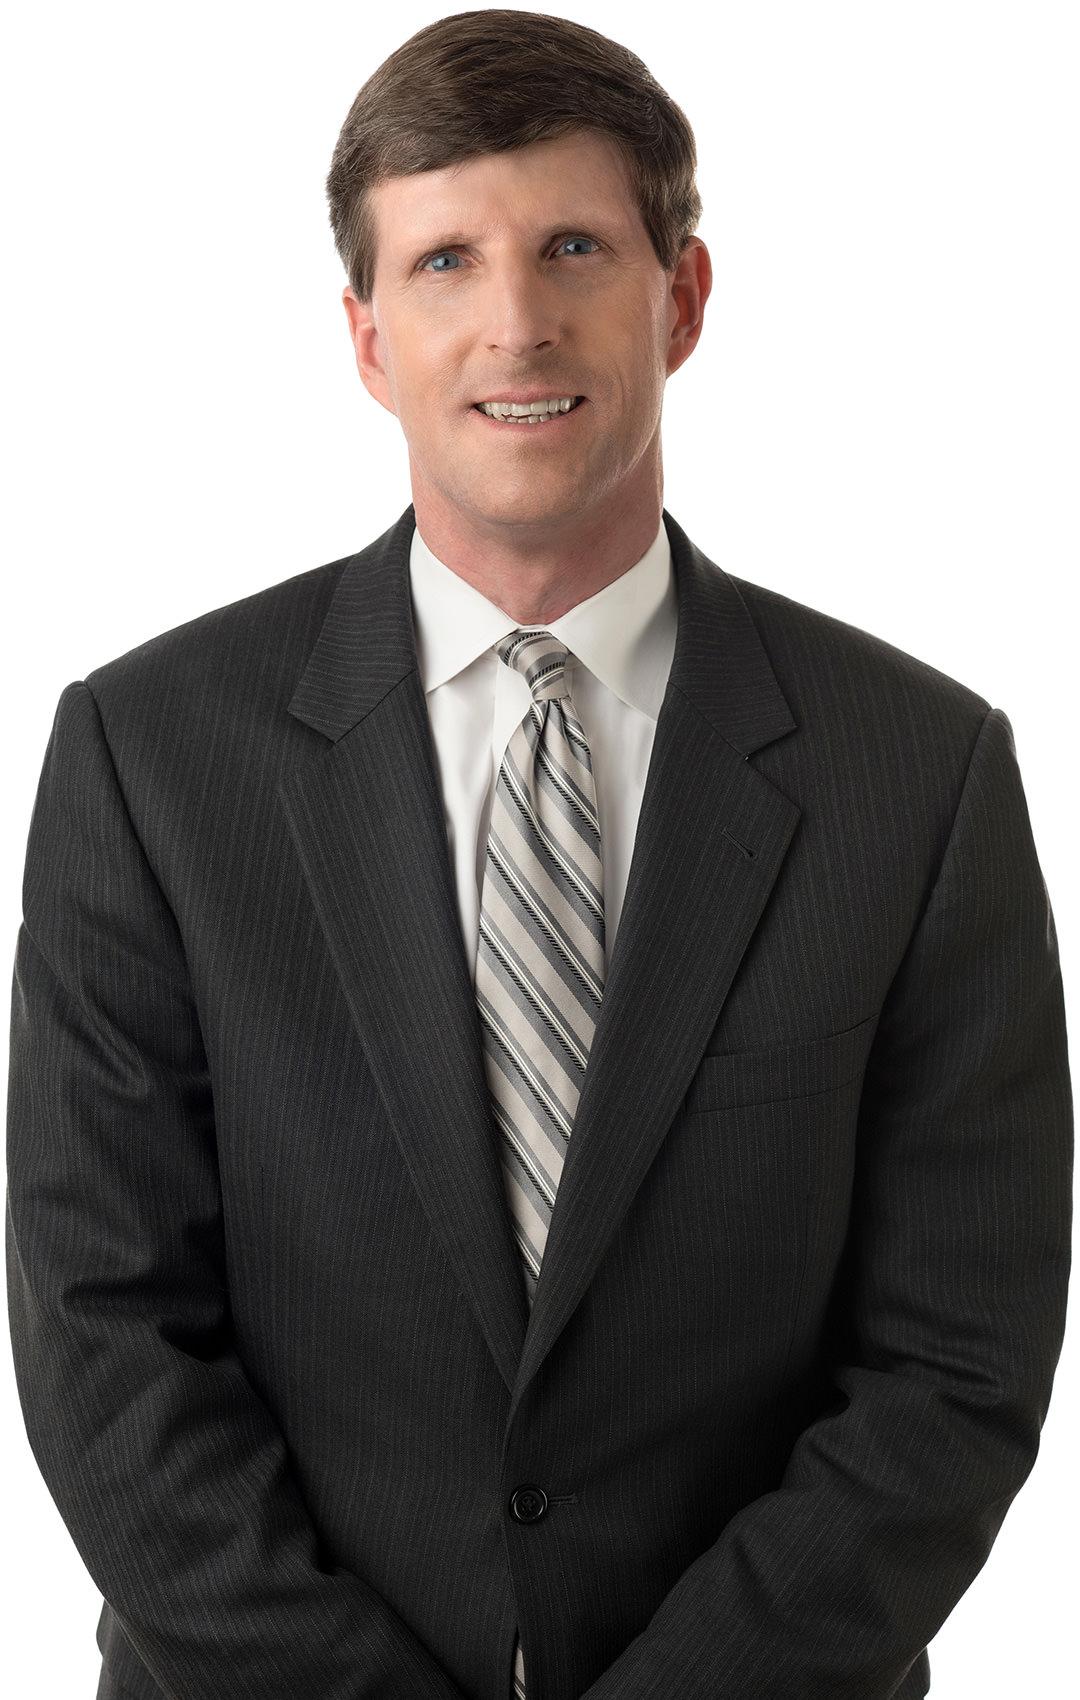 D. Larry Kristinik, III